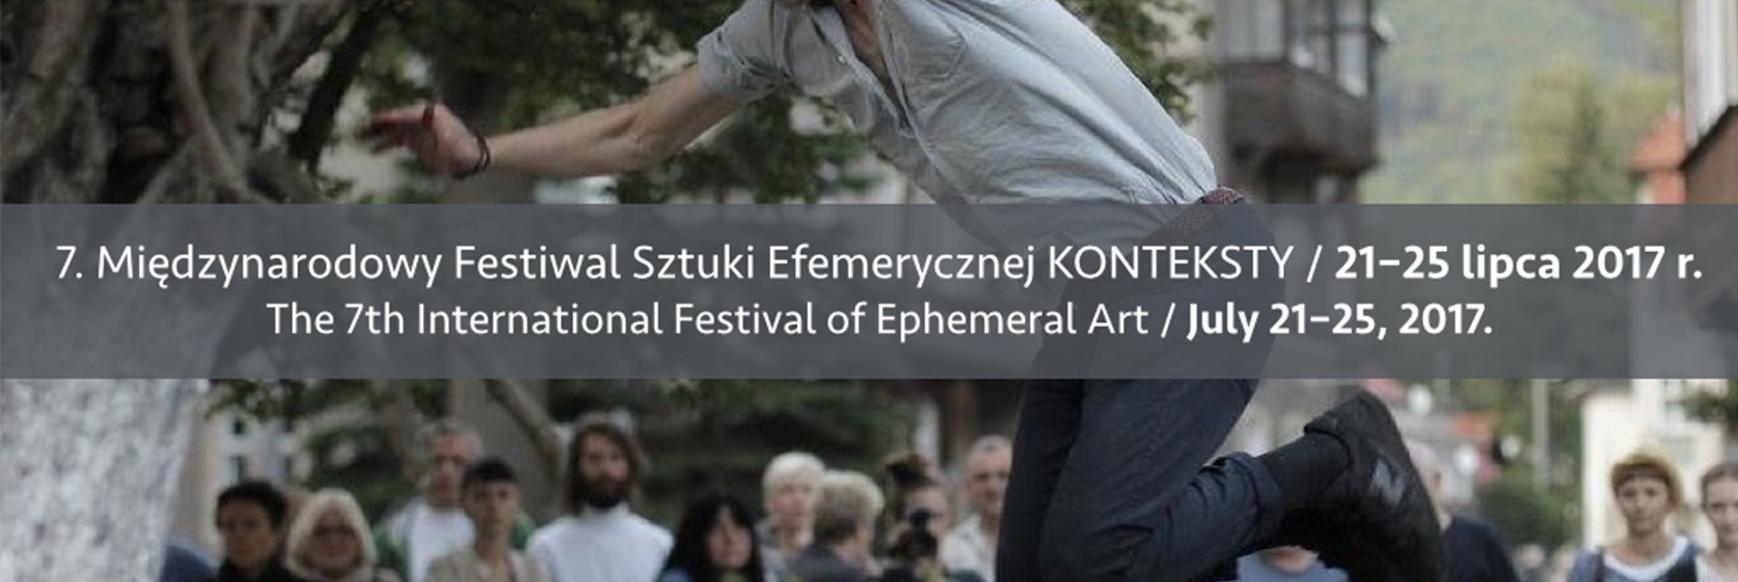 festiwal2017